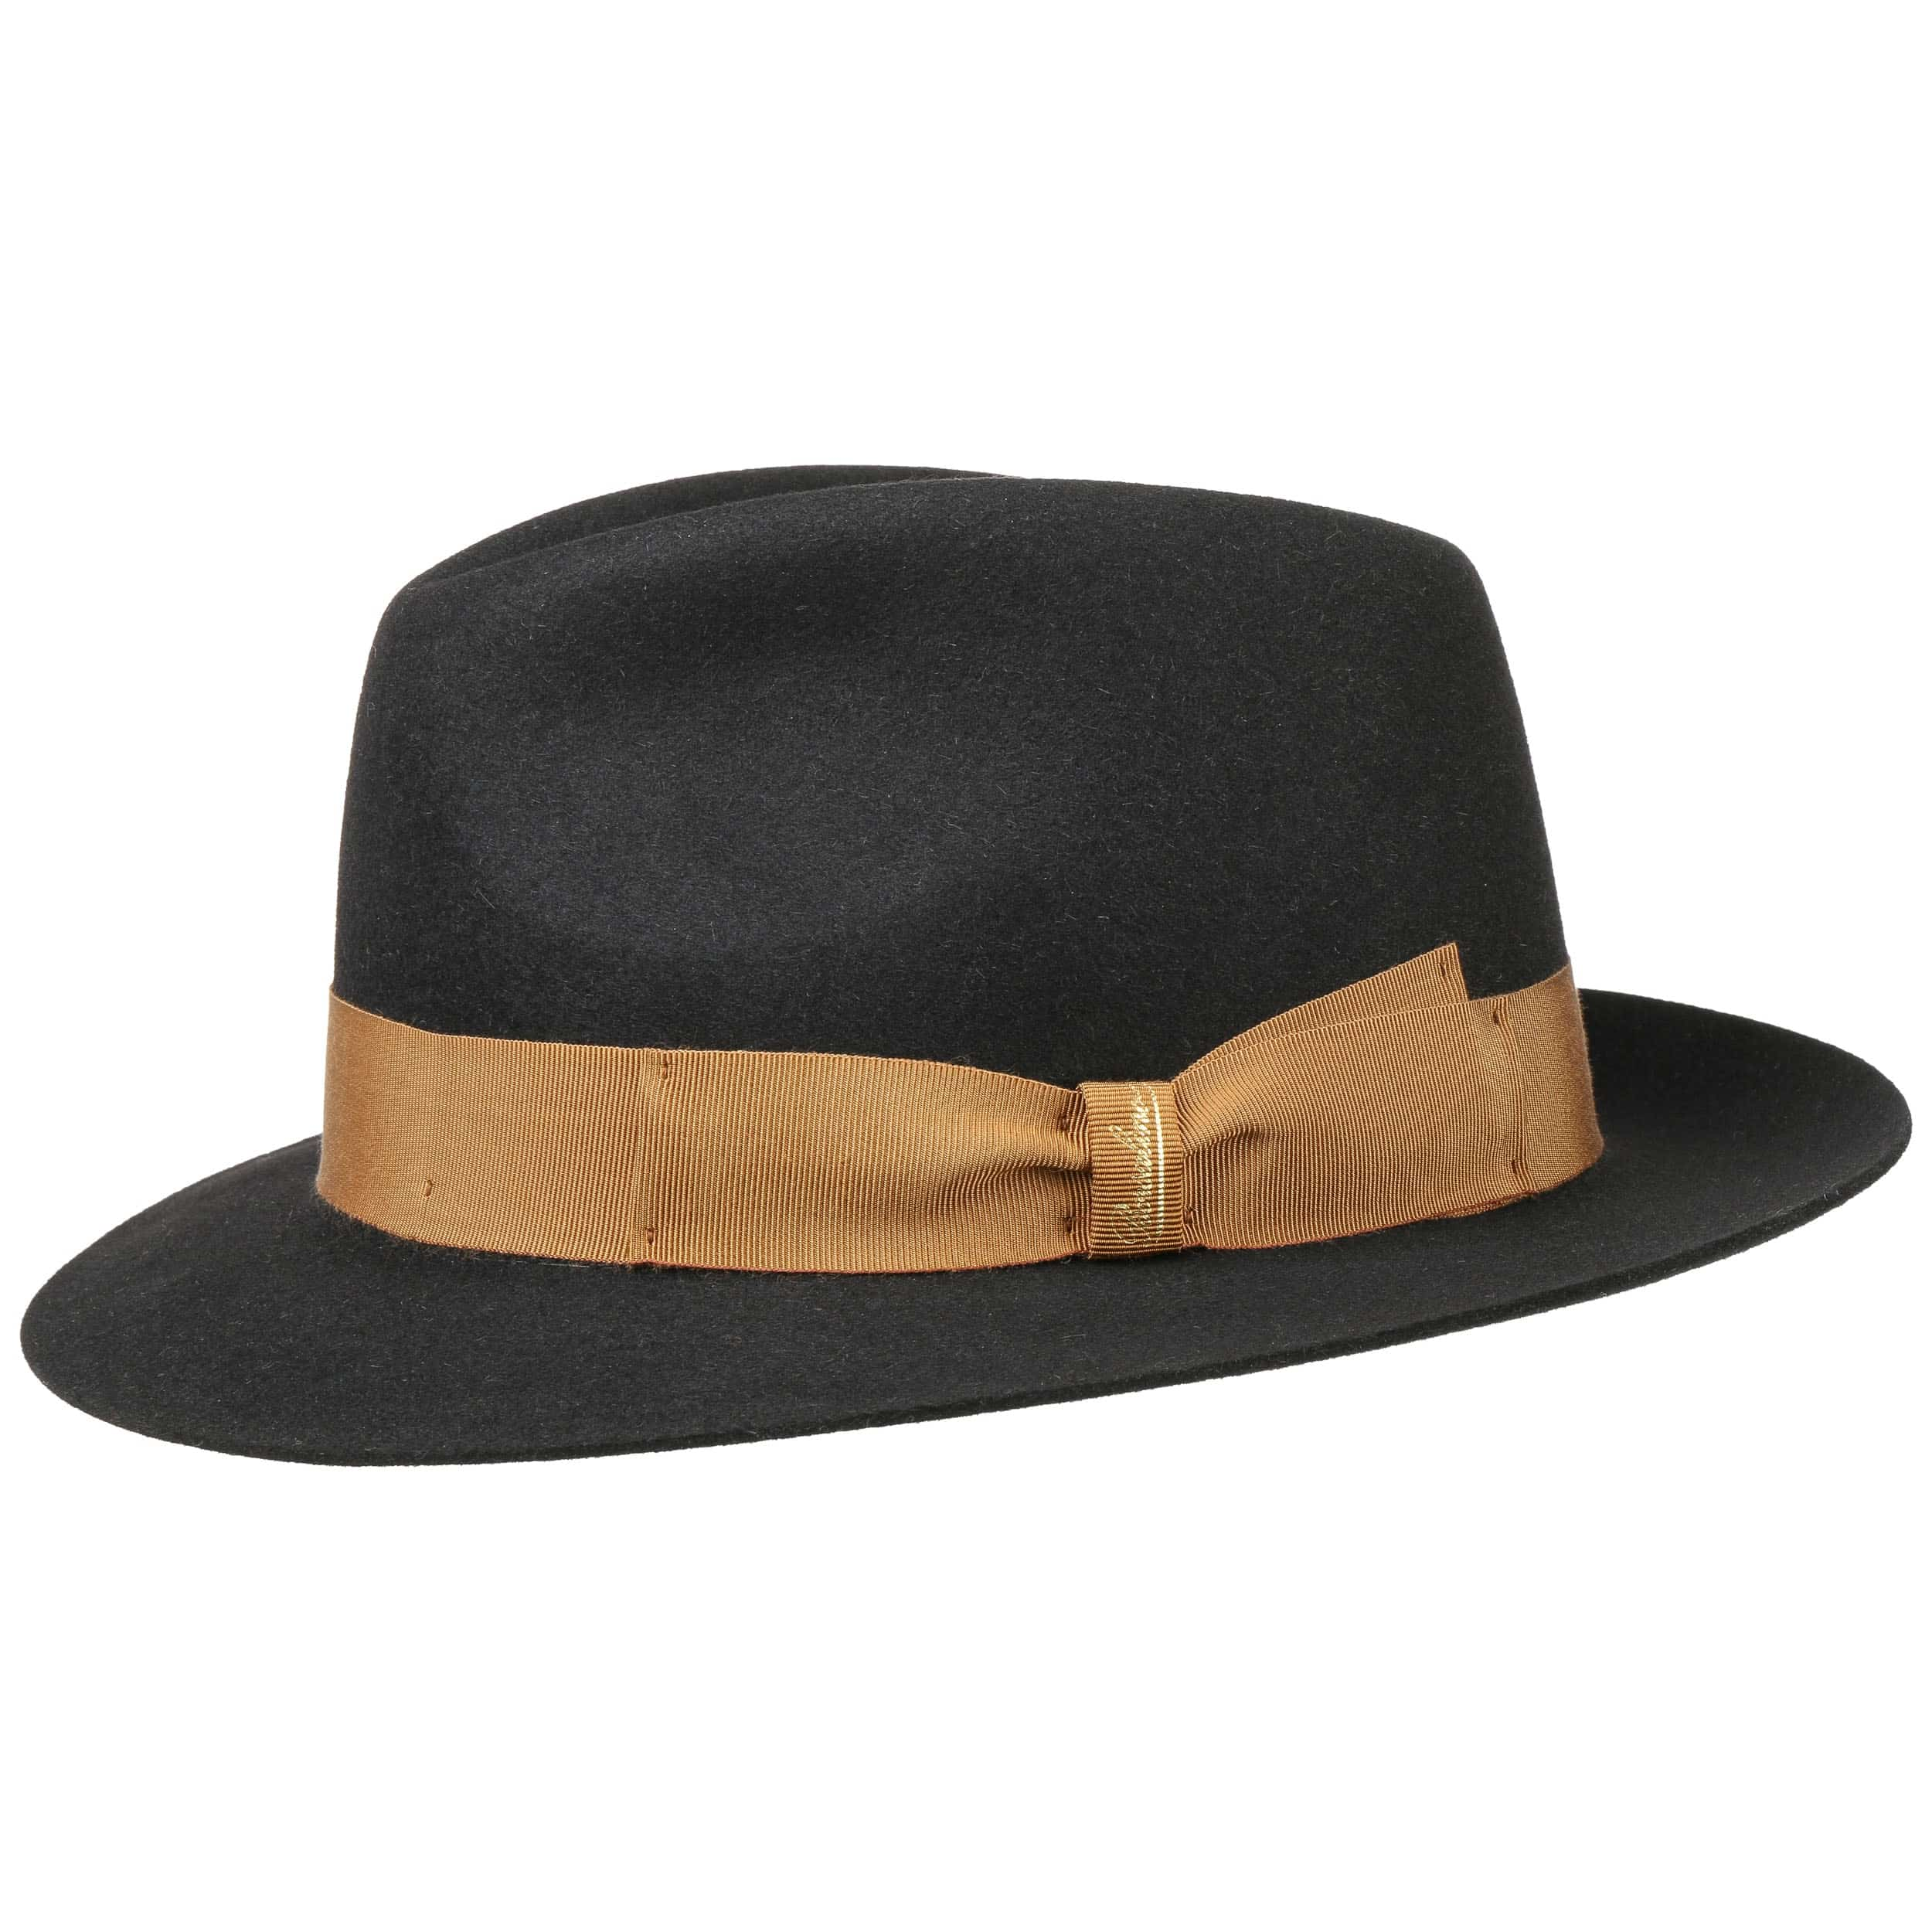 Sombrero Finissimo Twotone Fedora by Borsalino - Sombreros ... 2b48bff4074